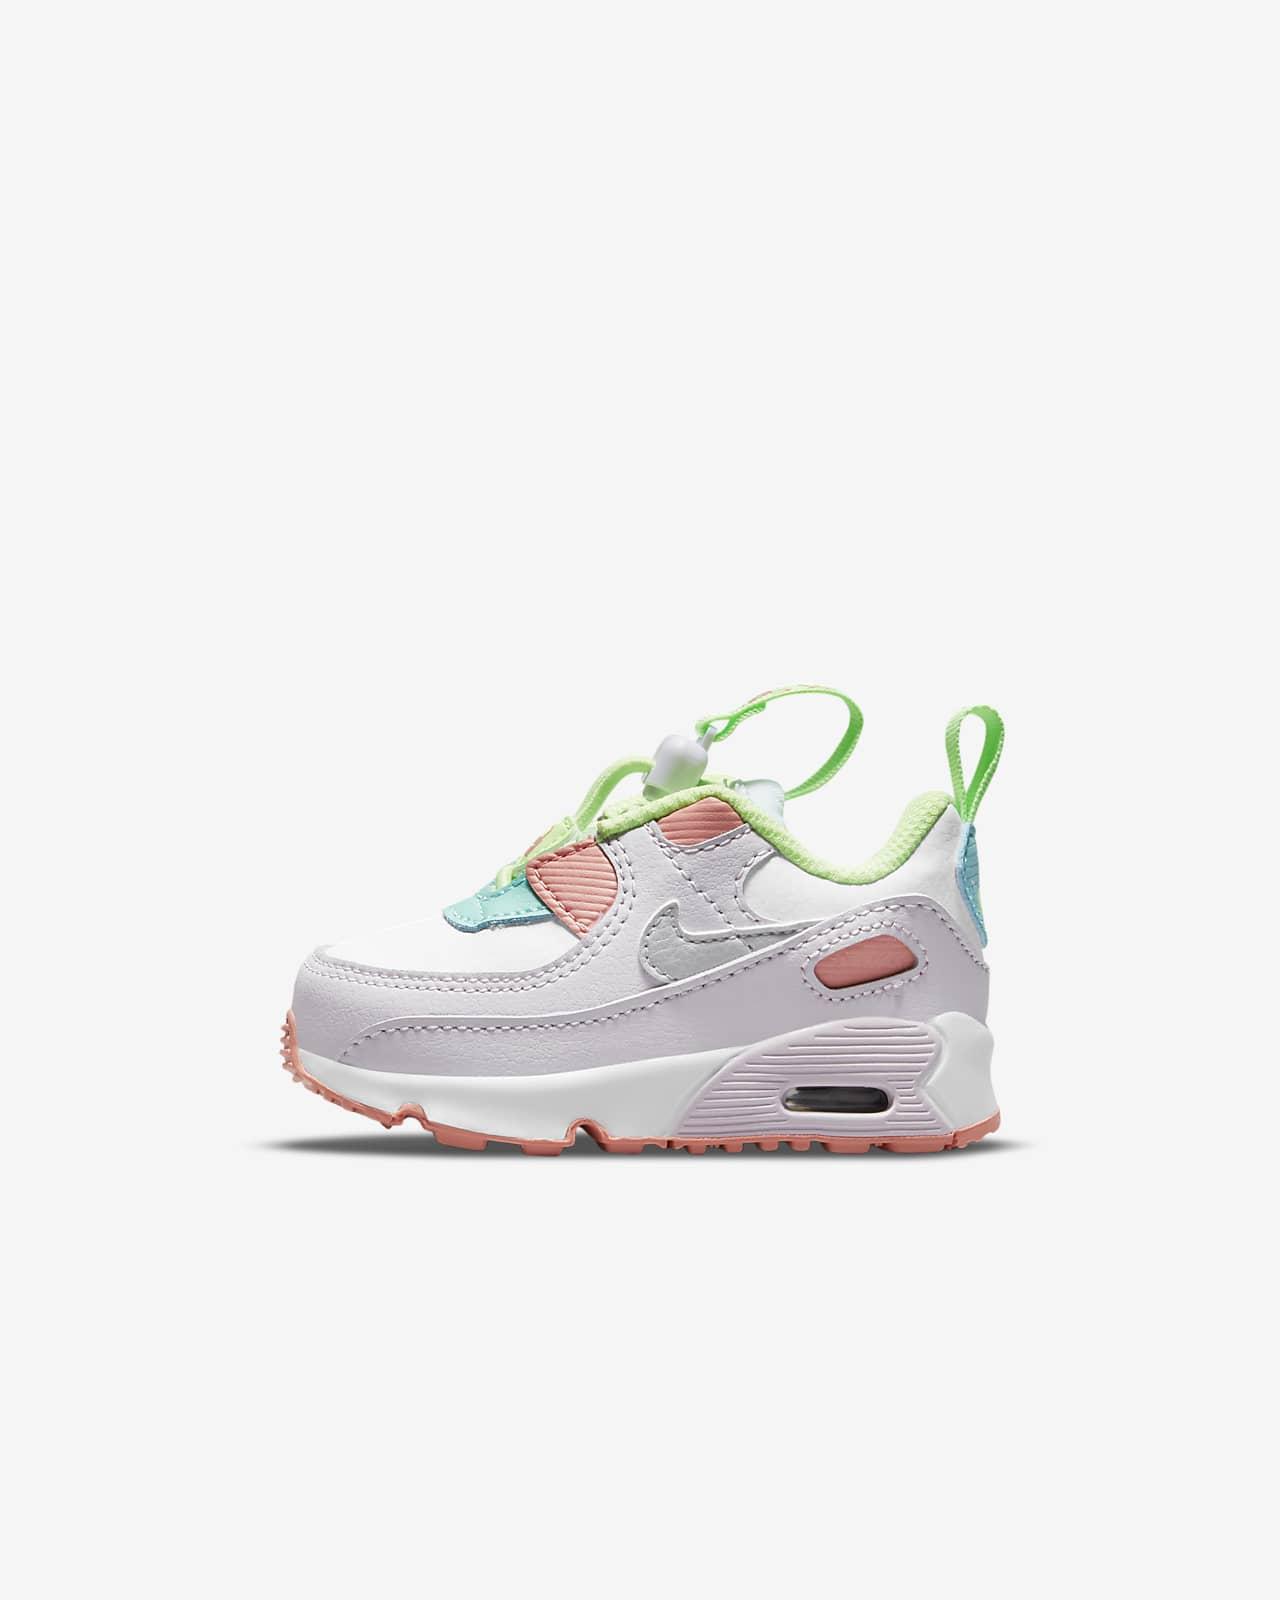 Nike Air Max 90 Toggle 嬰幼兒鞋款